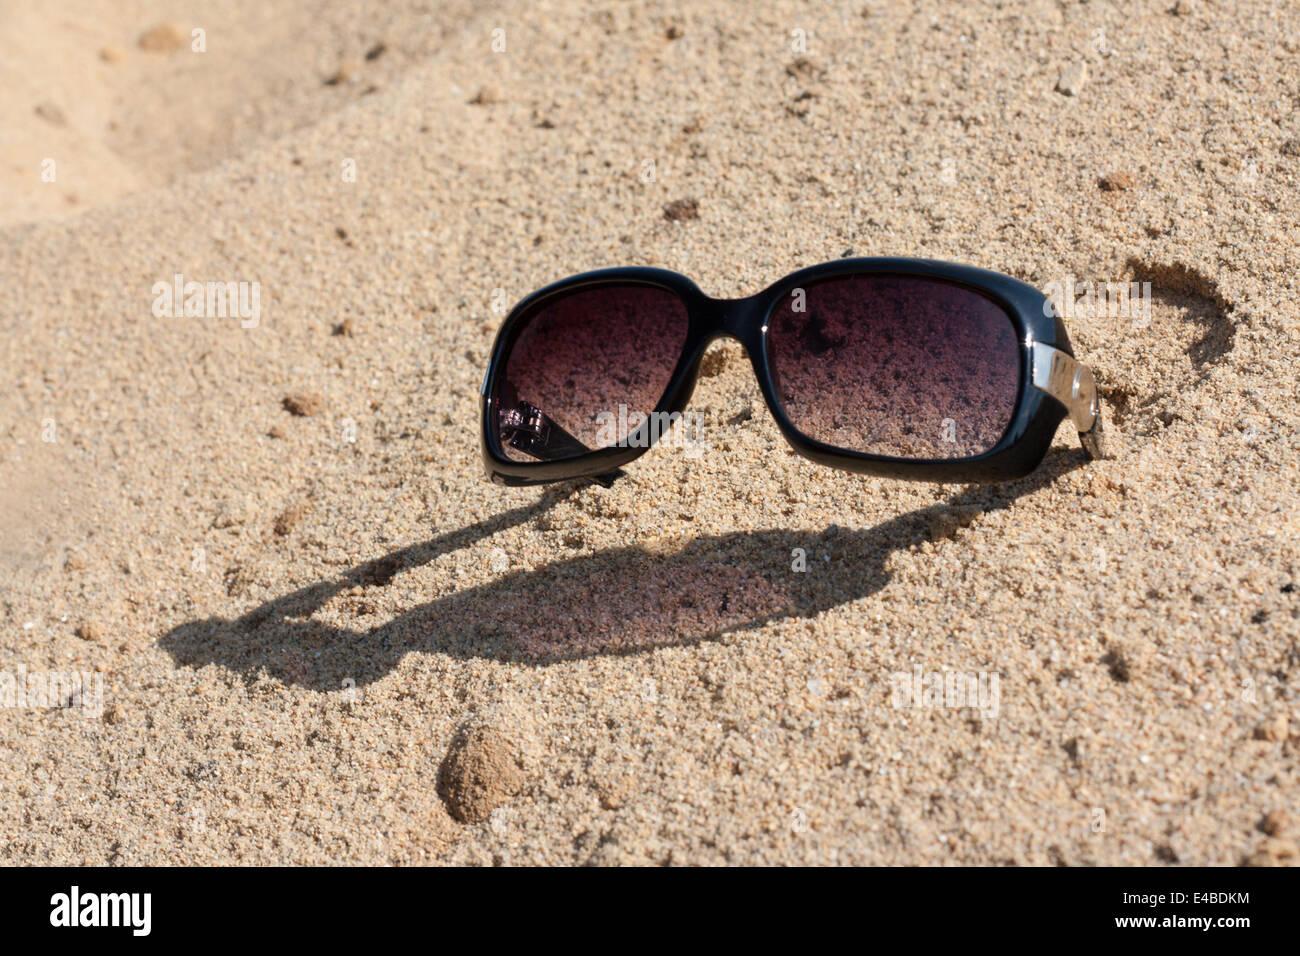 b9a365de8f9c Sunglasses On Song Stock Photos   Sunglasses On Song Stock Images ...